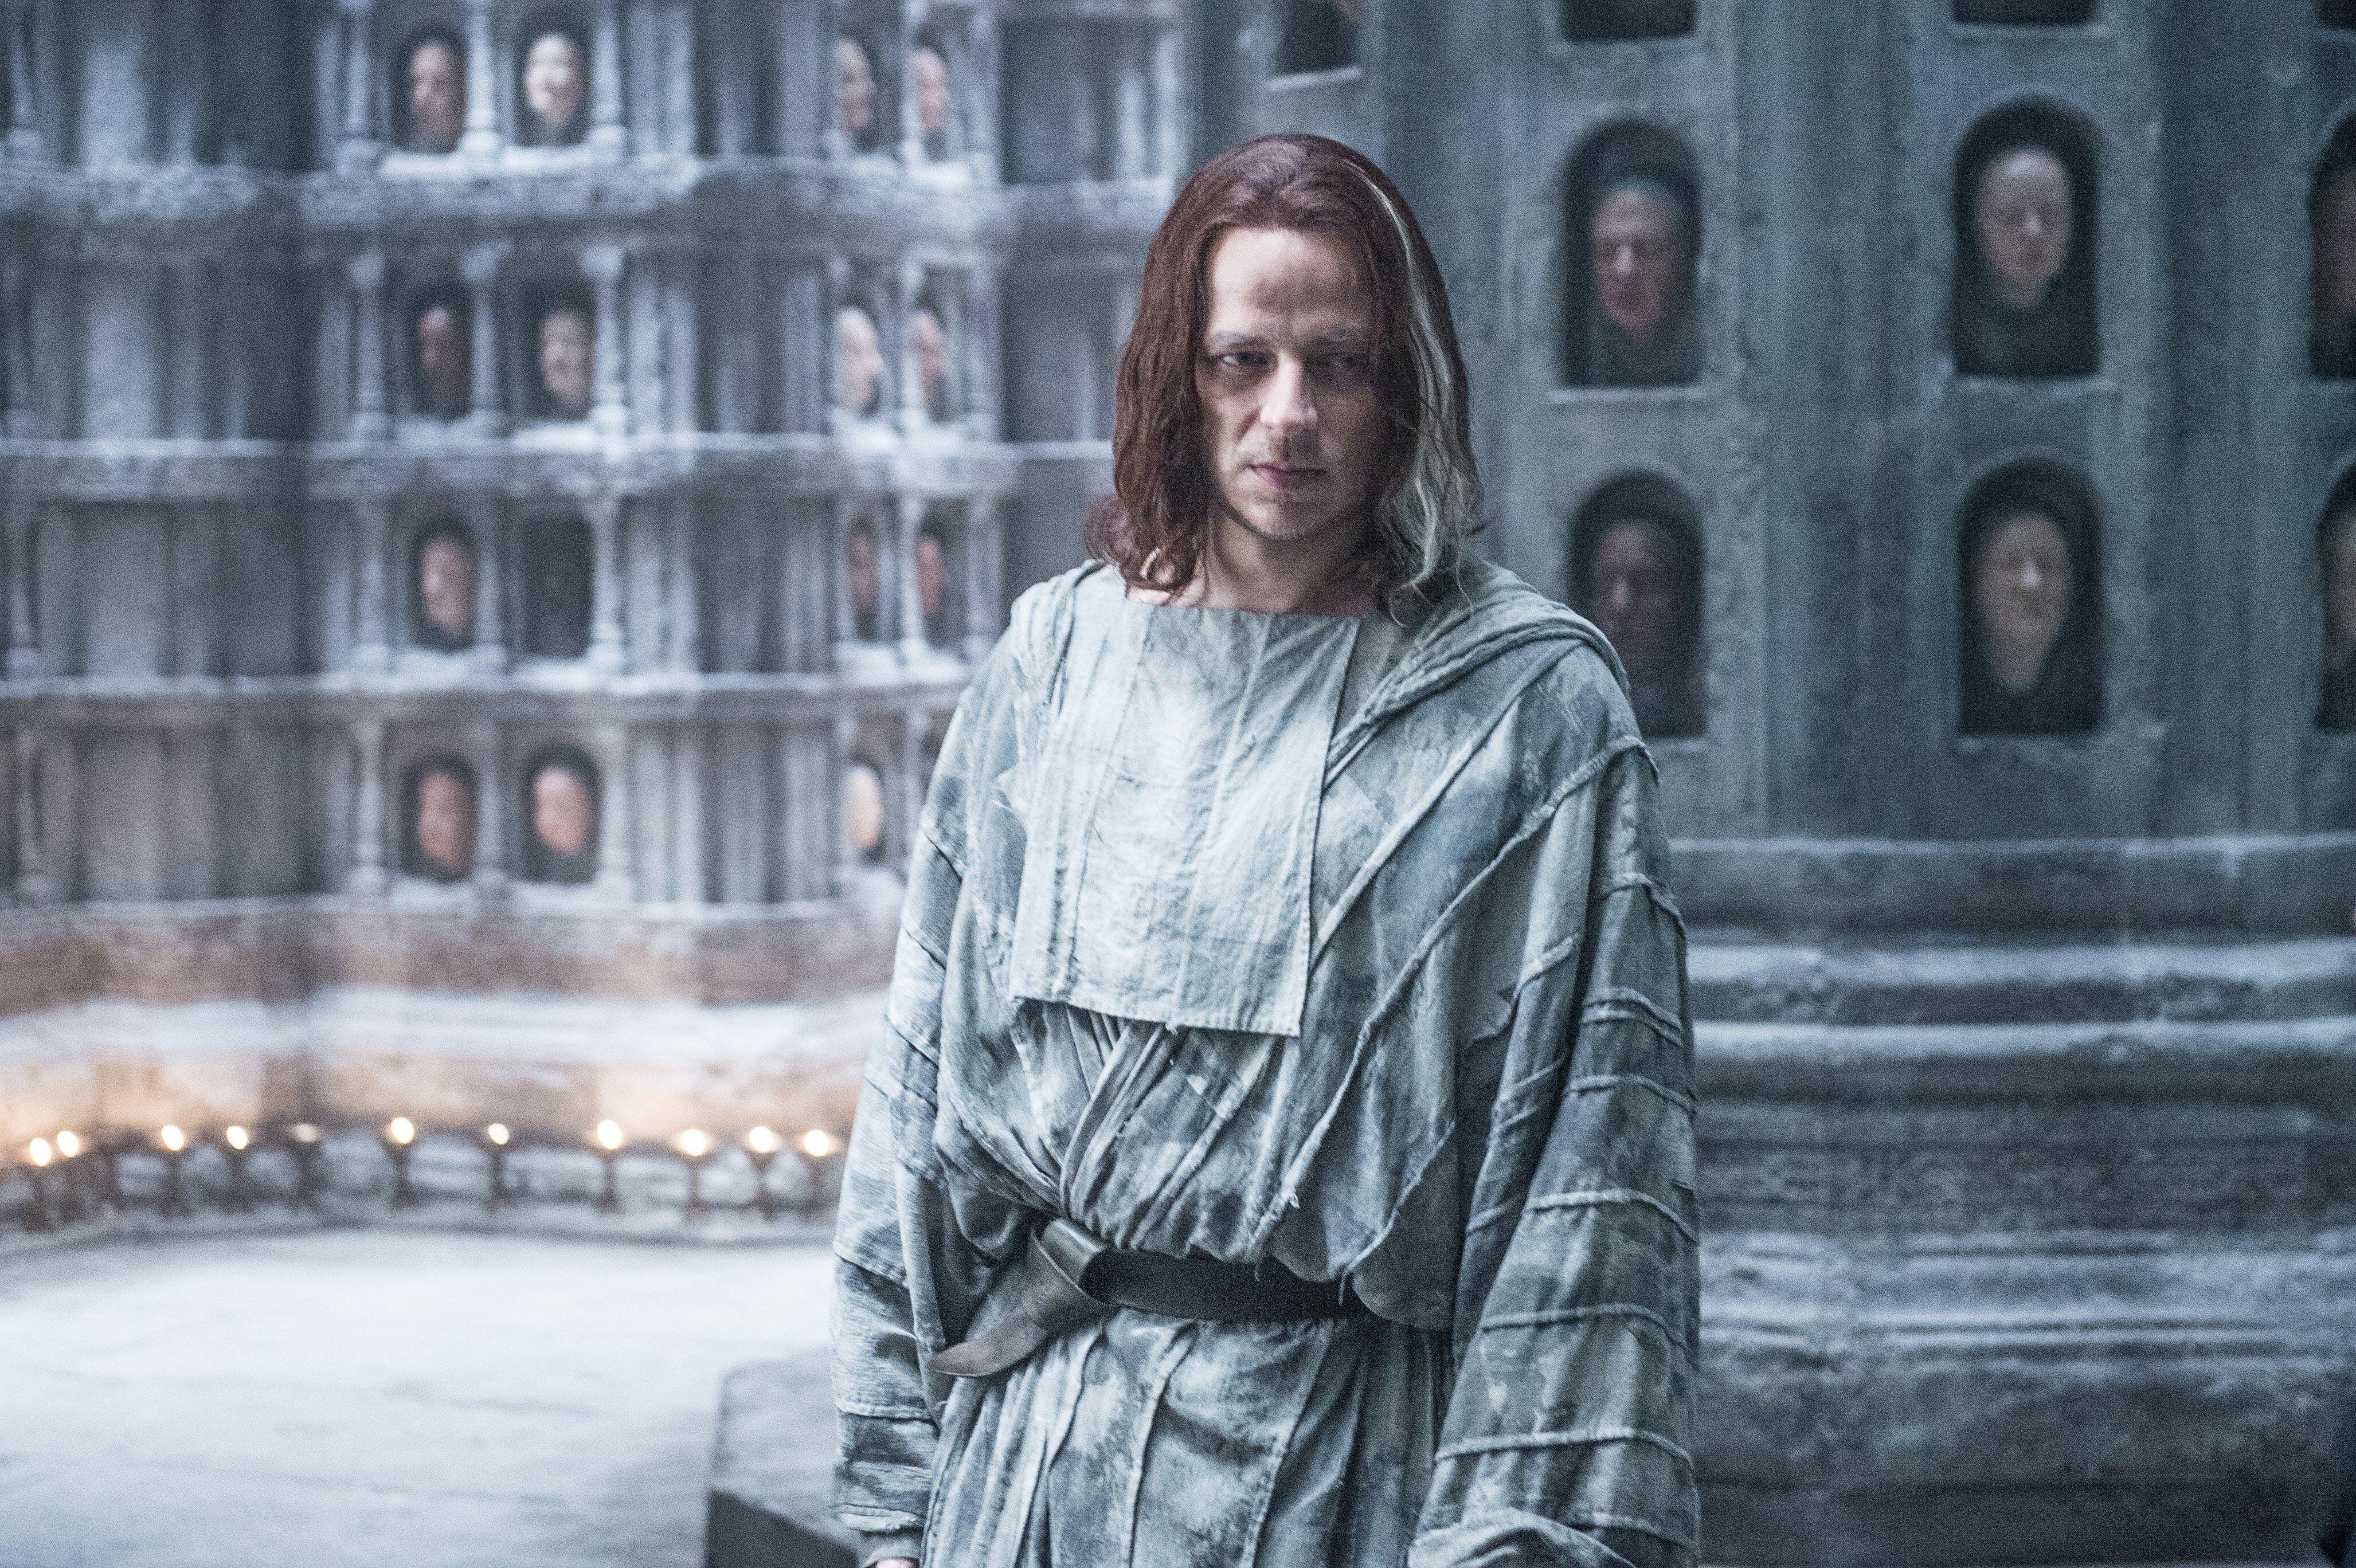 Tom Wlaschiha talks Jaqen H'ghar, and whether he'll return for season 8